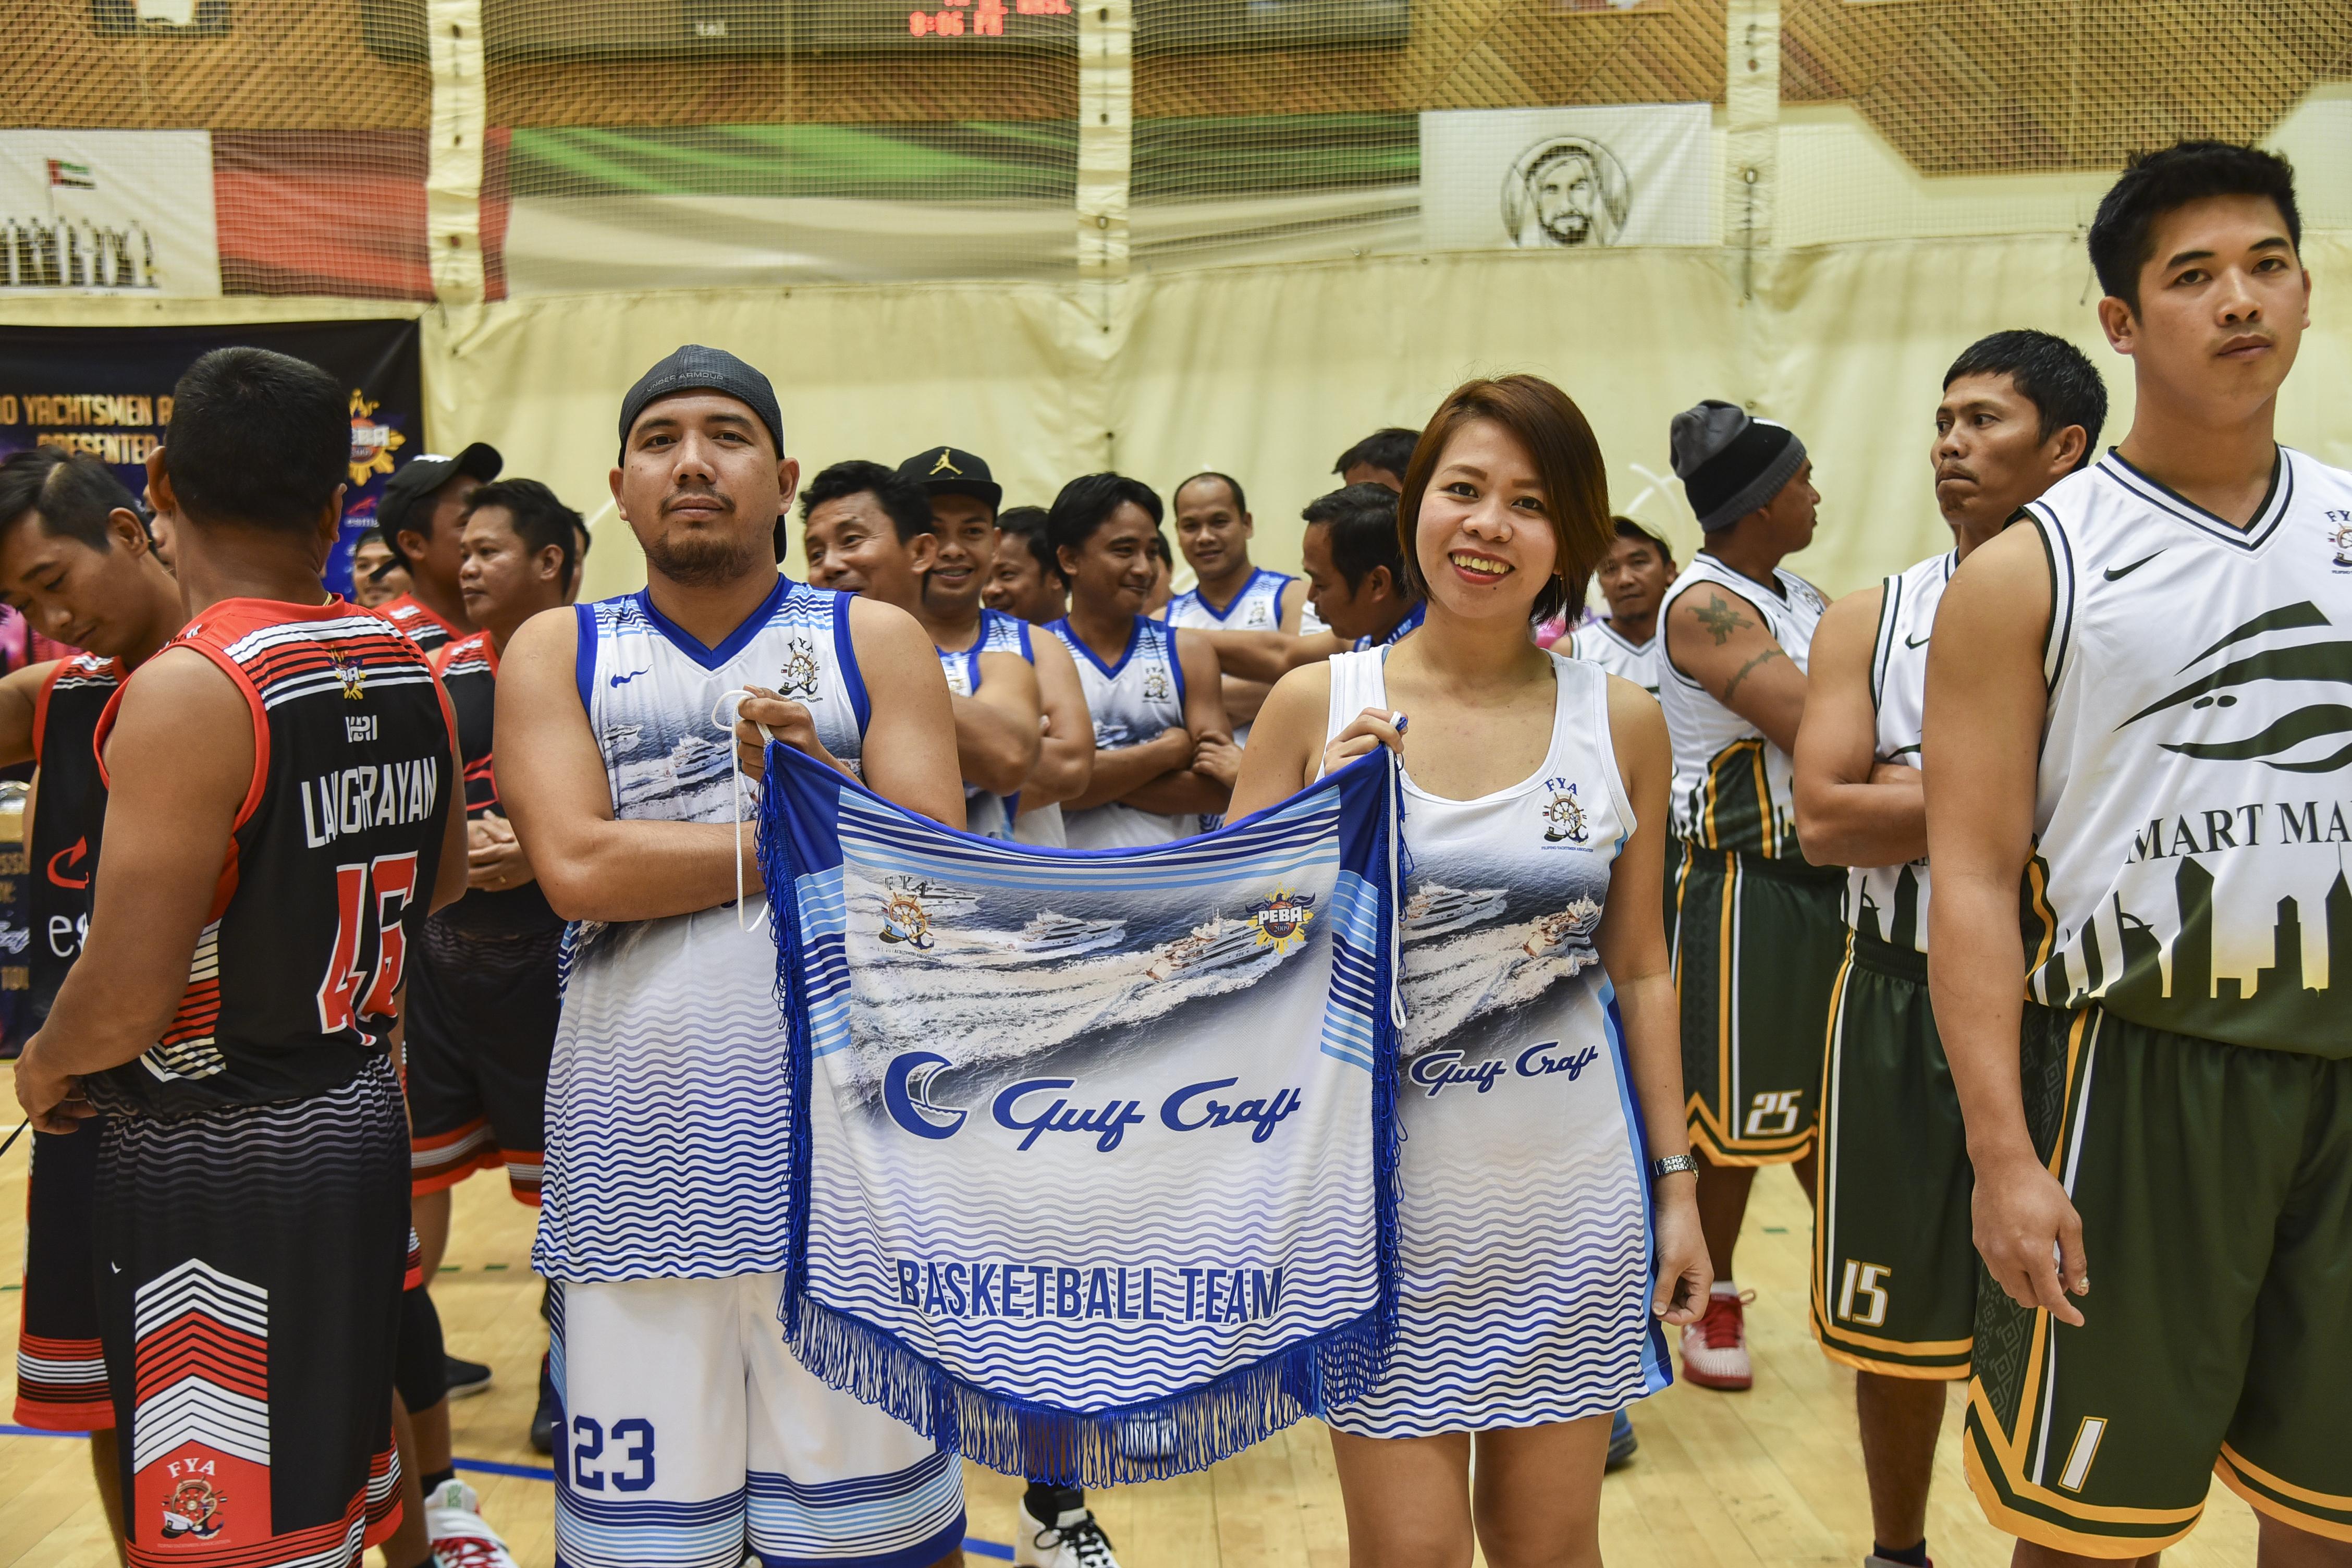 GCI at FYA Basketball Tournament Season 1 2018 Opening (1).jpg